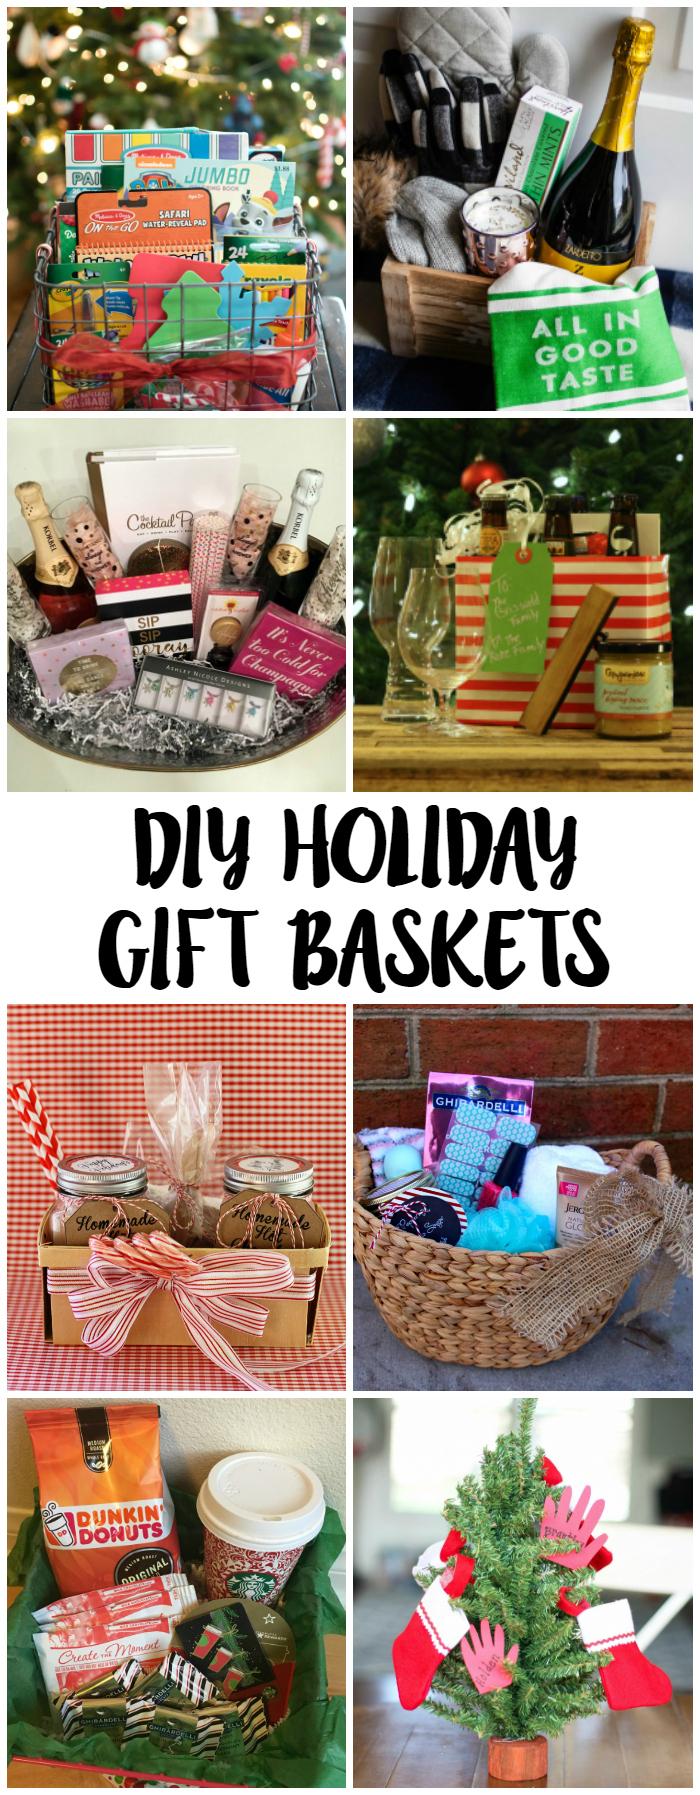 DIY Holiday Gift Basket Ideas